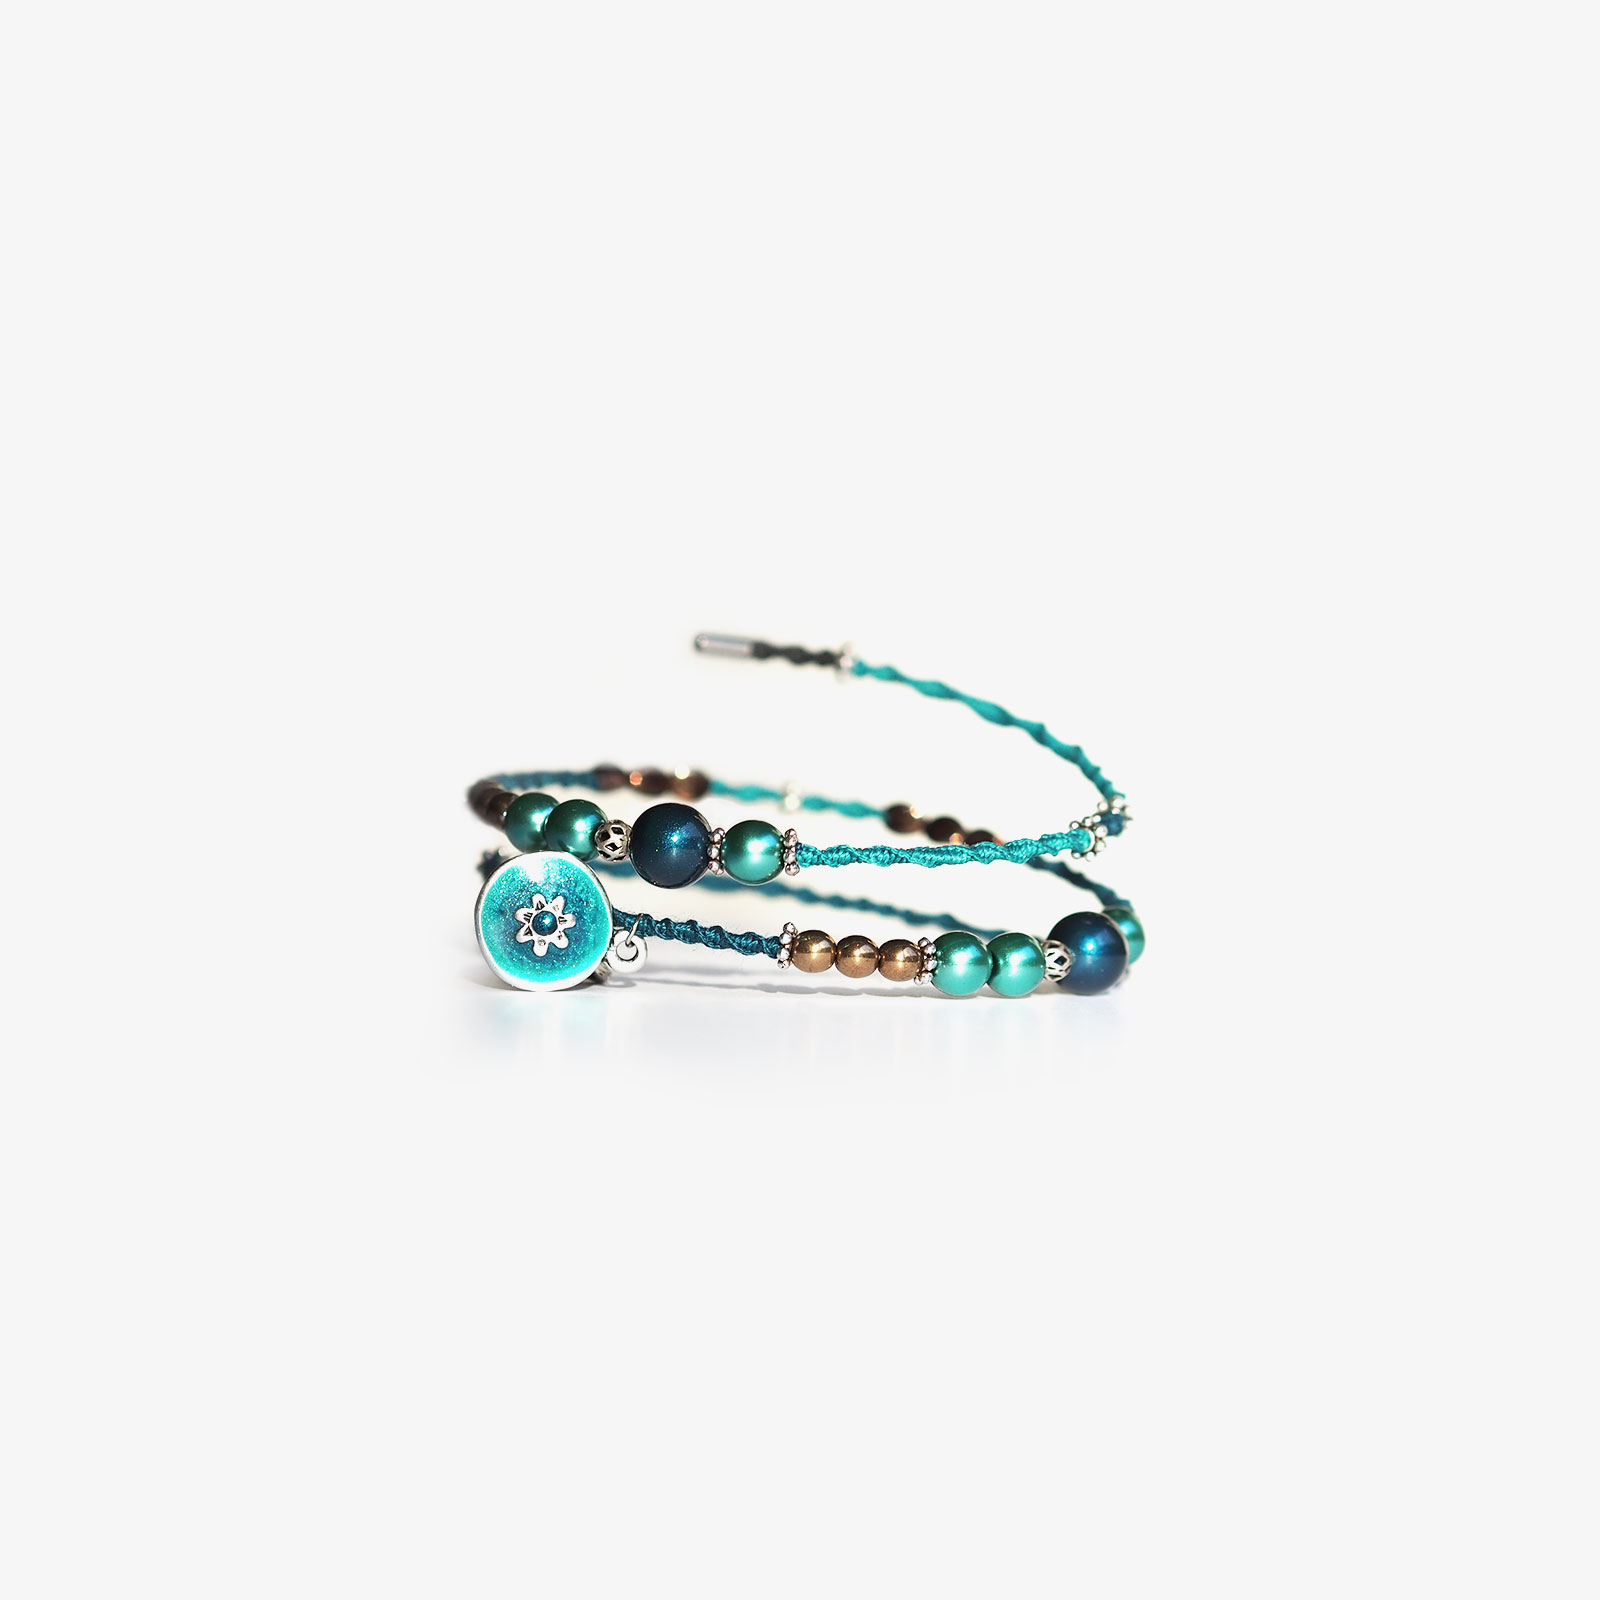 bracelet tressé main cristal Swarovski turquoise teal laboutiquedemelimelo